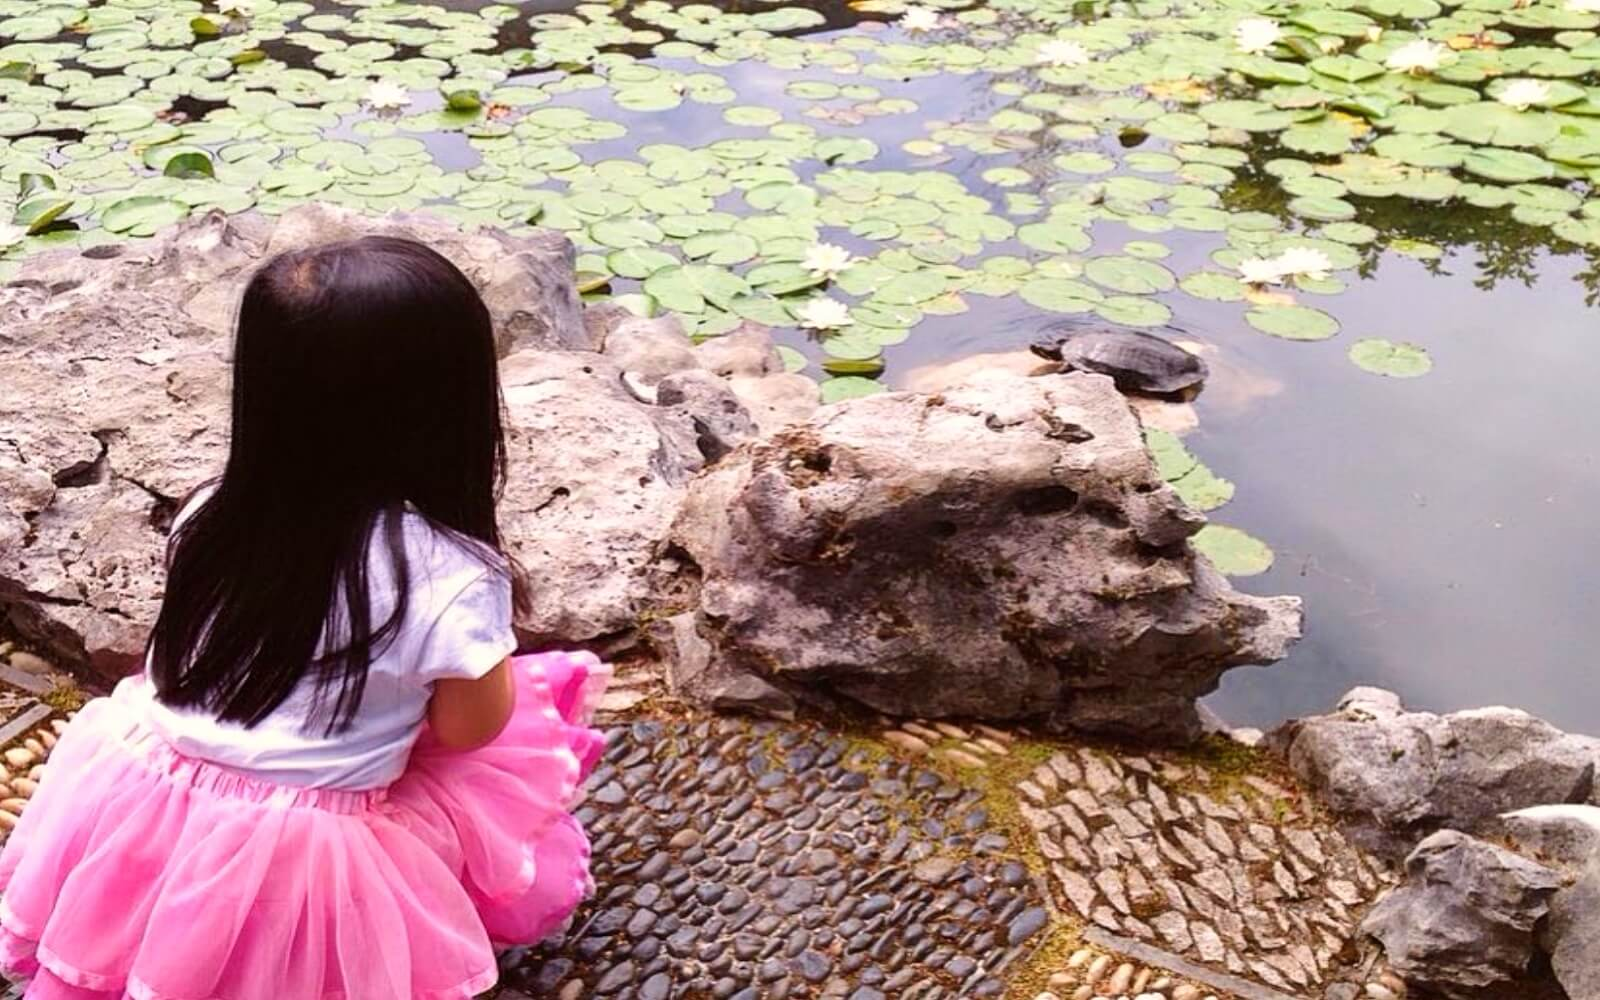 Little girl watches a turtle at the Sun Yat-Sen Classical Garden